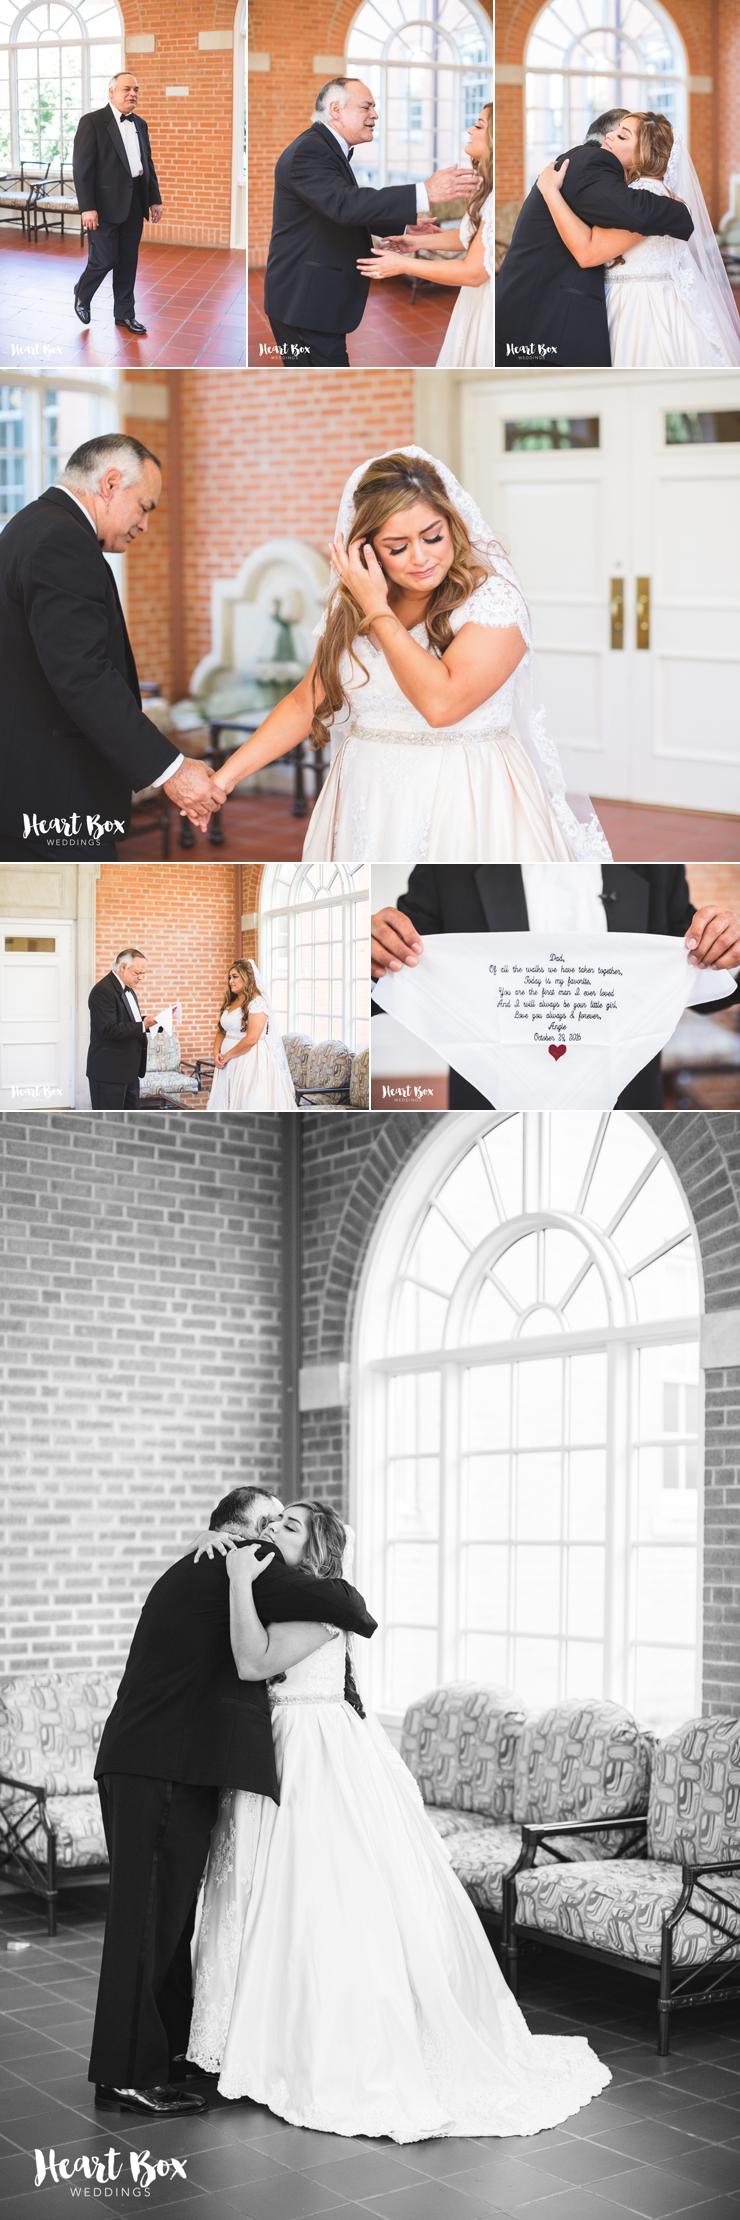 Montero Wedding BC 5.jpg